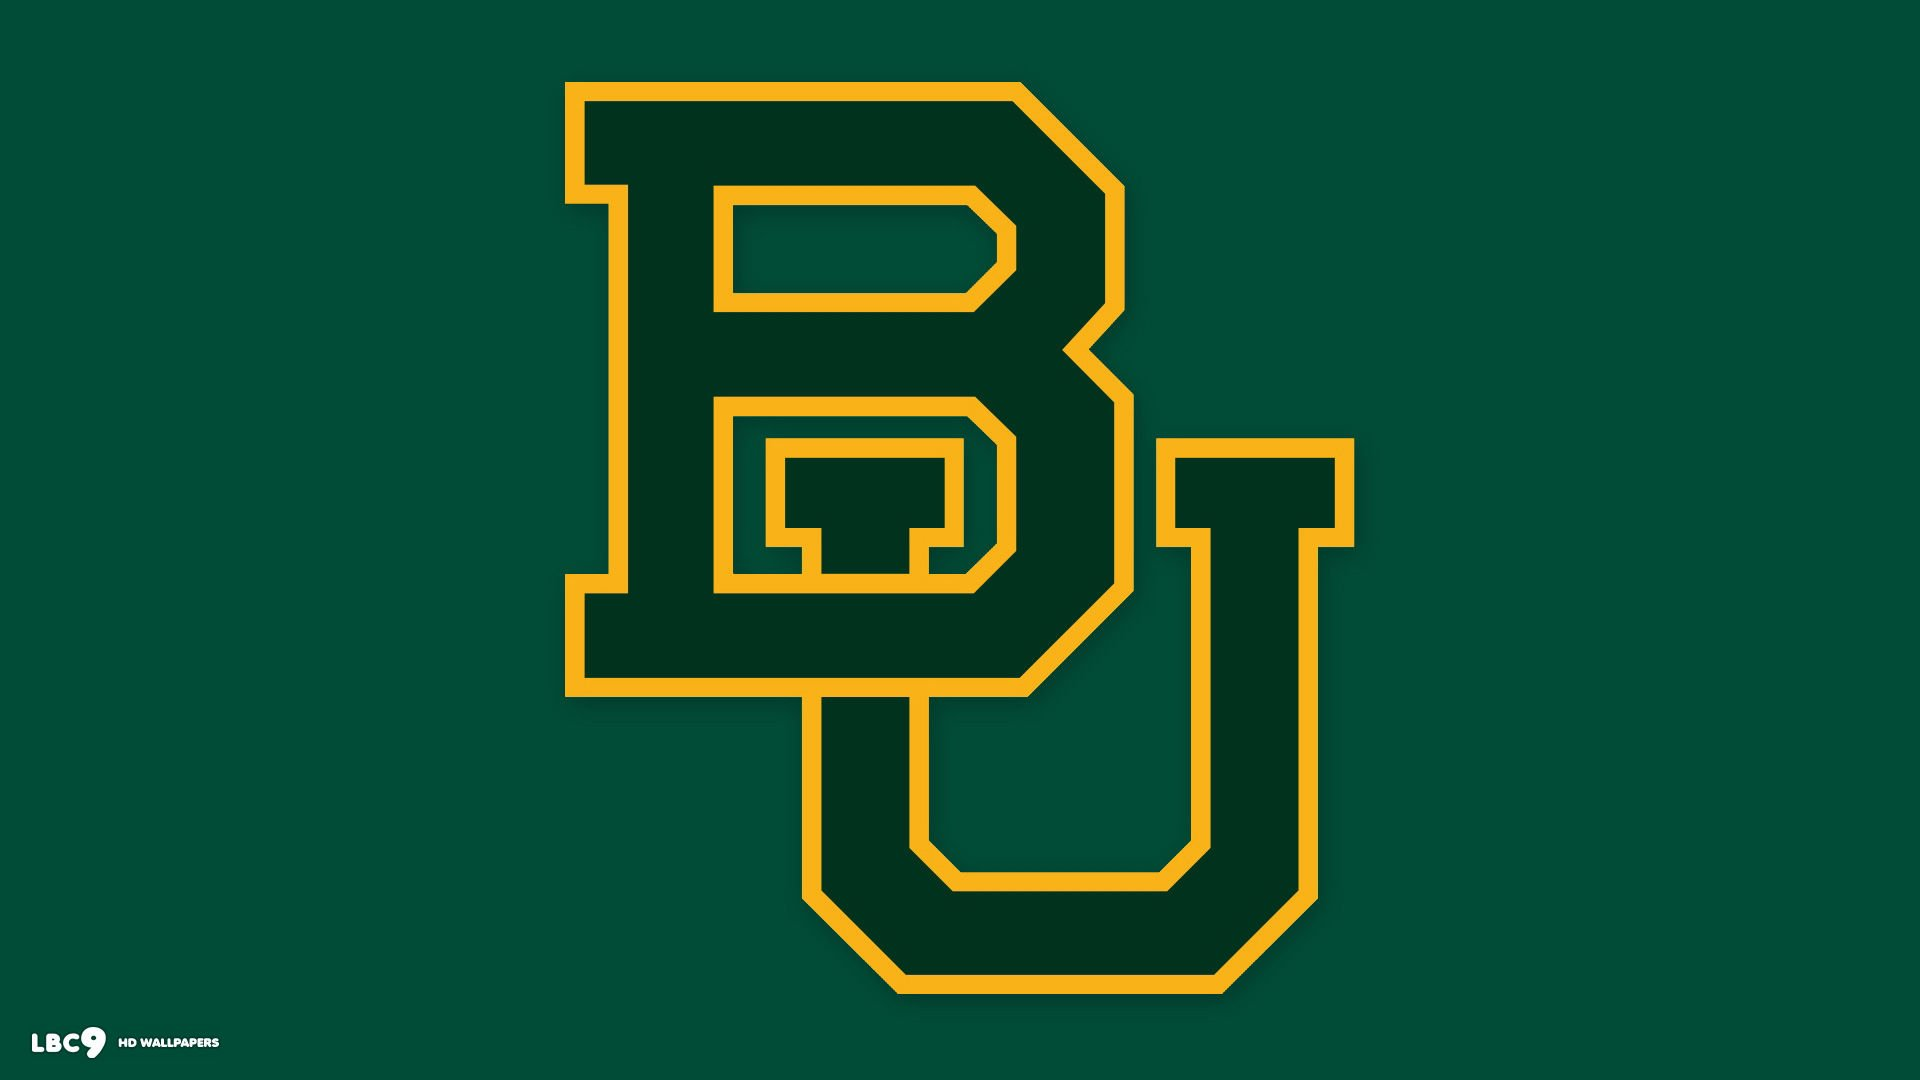 Baylor Football Wallpaper Baylor Bears College Football